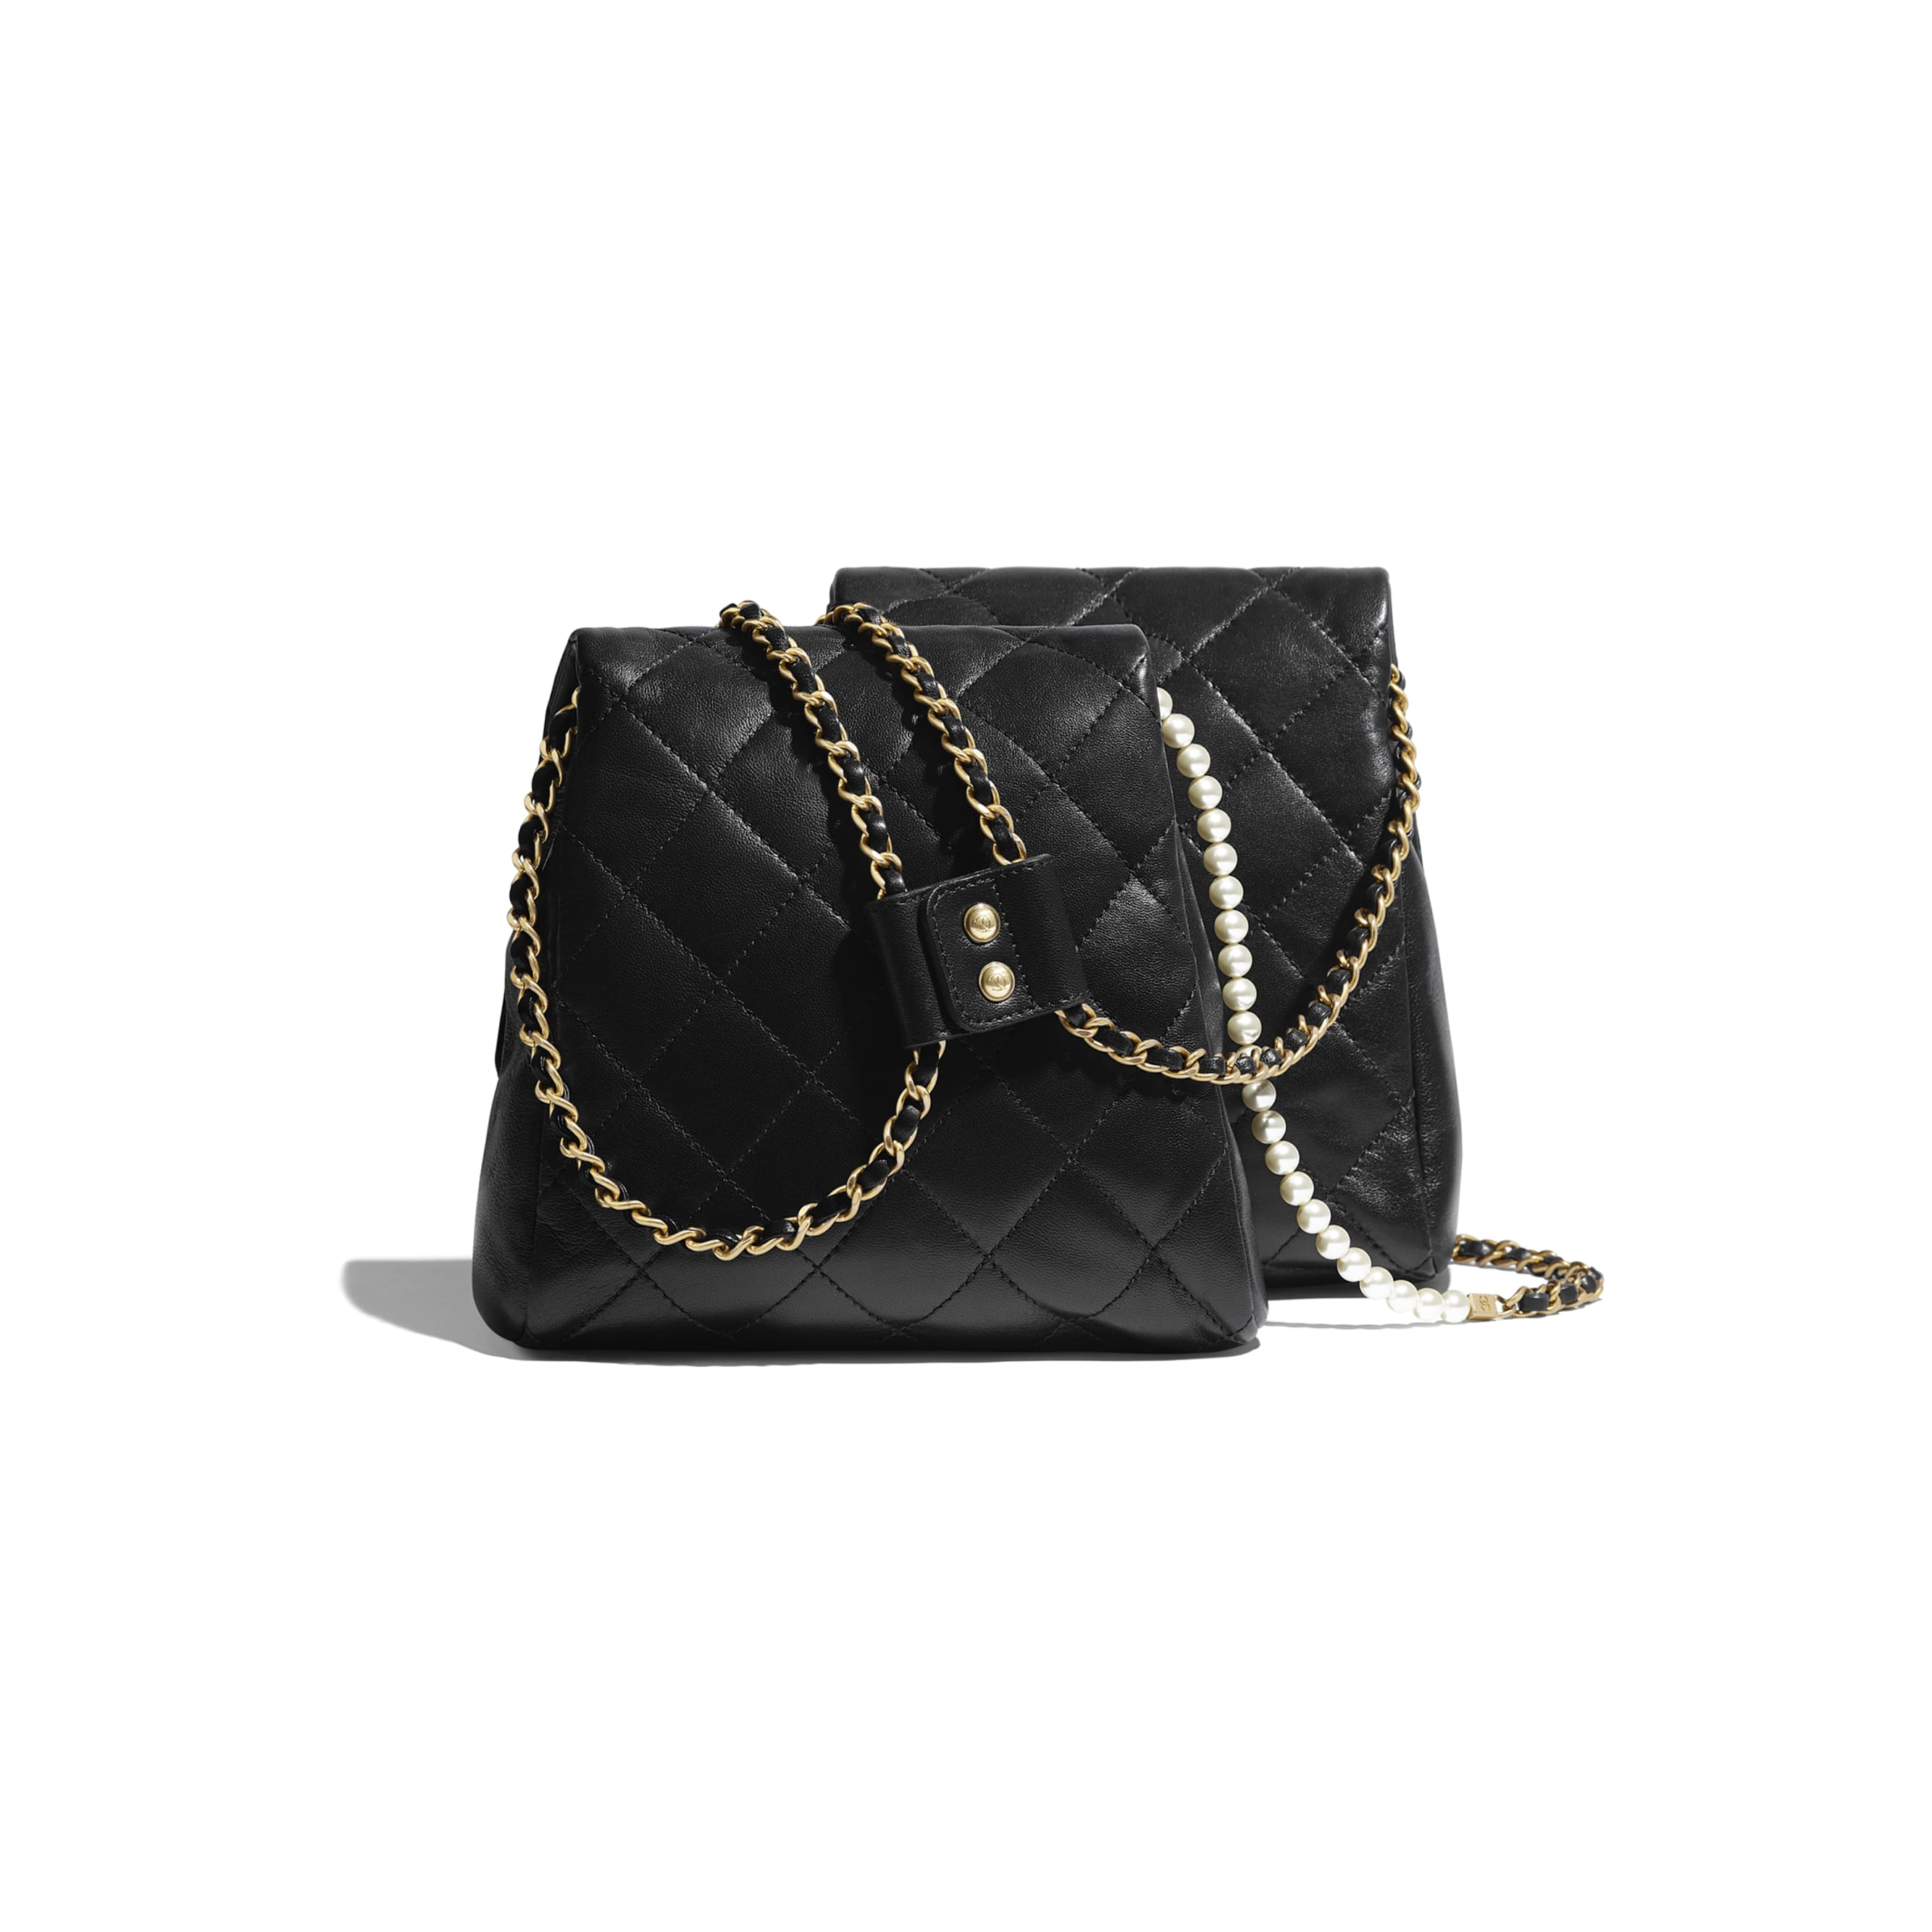 Side-Packs - Black - Lambskin, Imitation Pearls & Gold-Tone Metal - Alternative view - see standard sized version